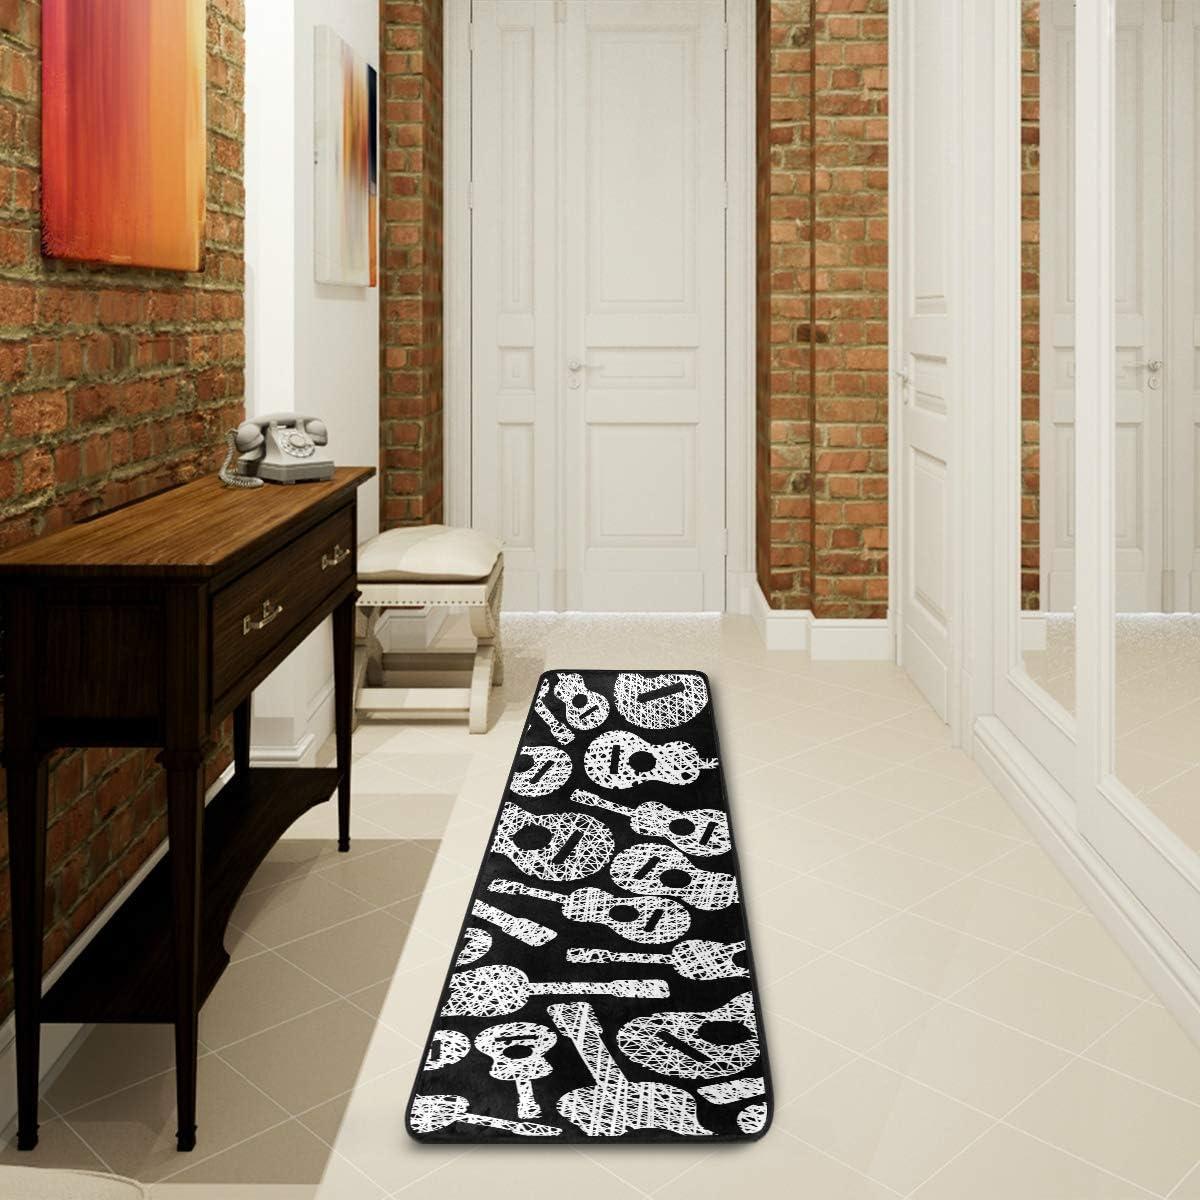 LUPINZ Guitars Music Theme Bathroom Mat Rugs Runner Hallway Entry Carpet 72x24 inch